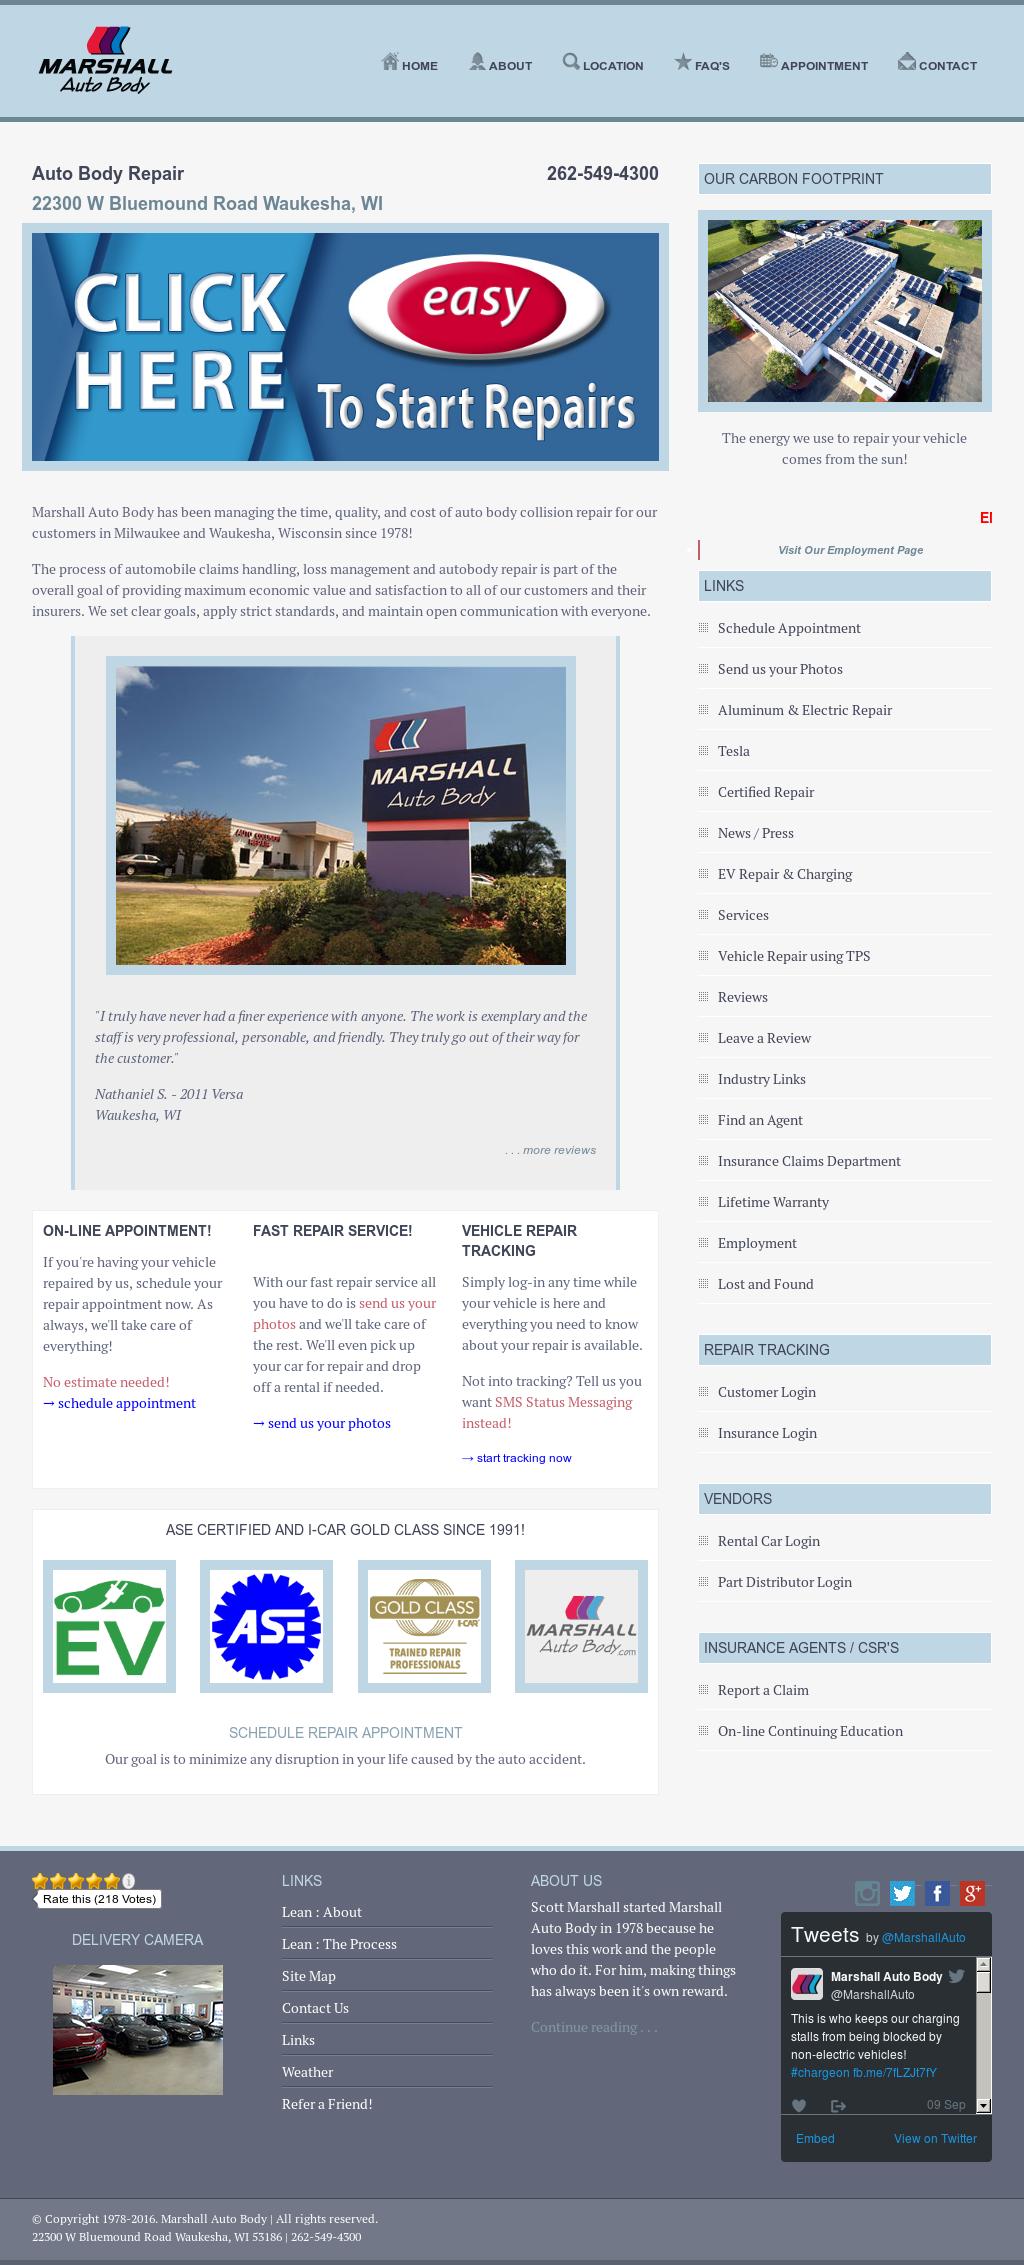 Wisconsinautobody petitors Revenue and Employees Owler pany